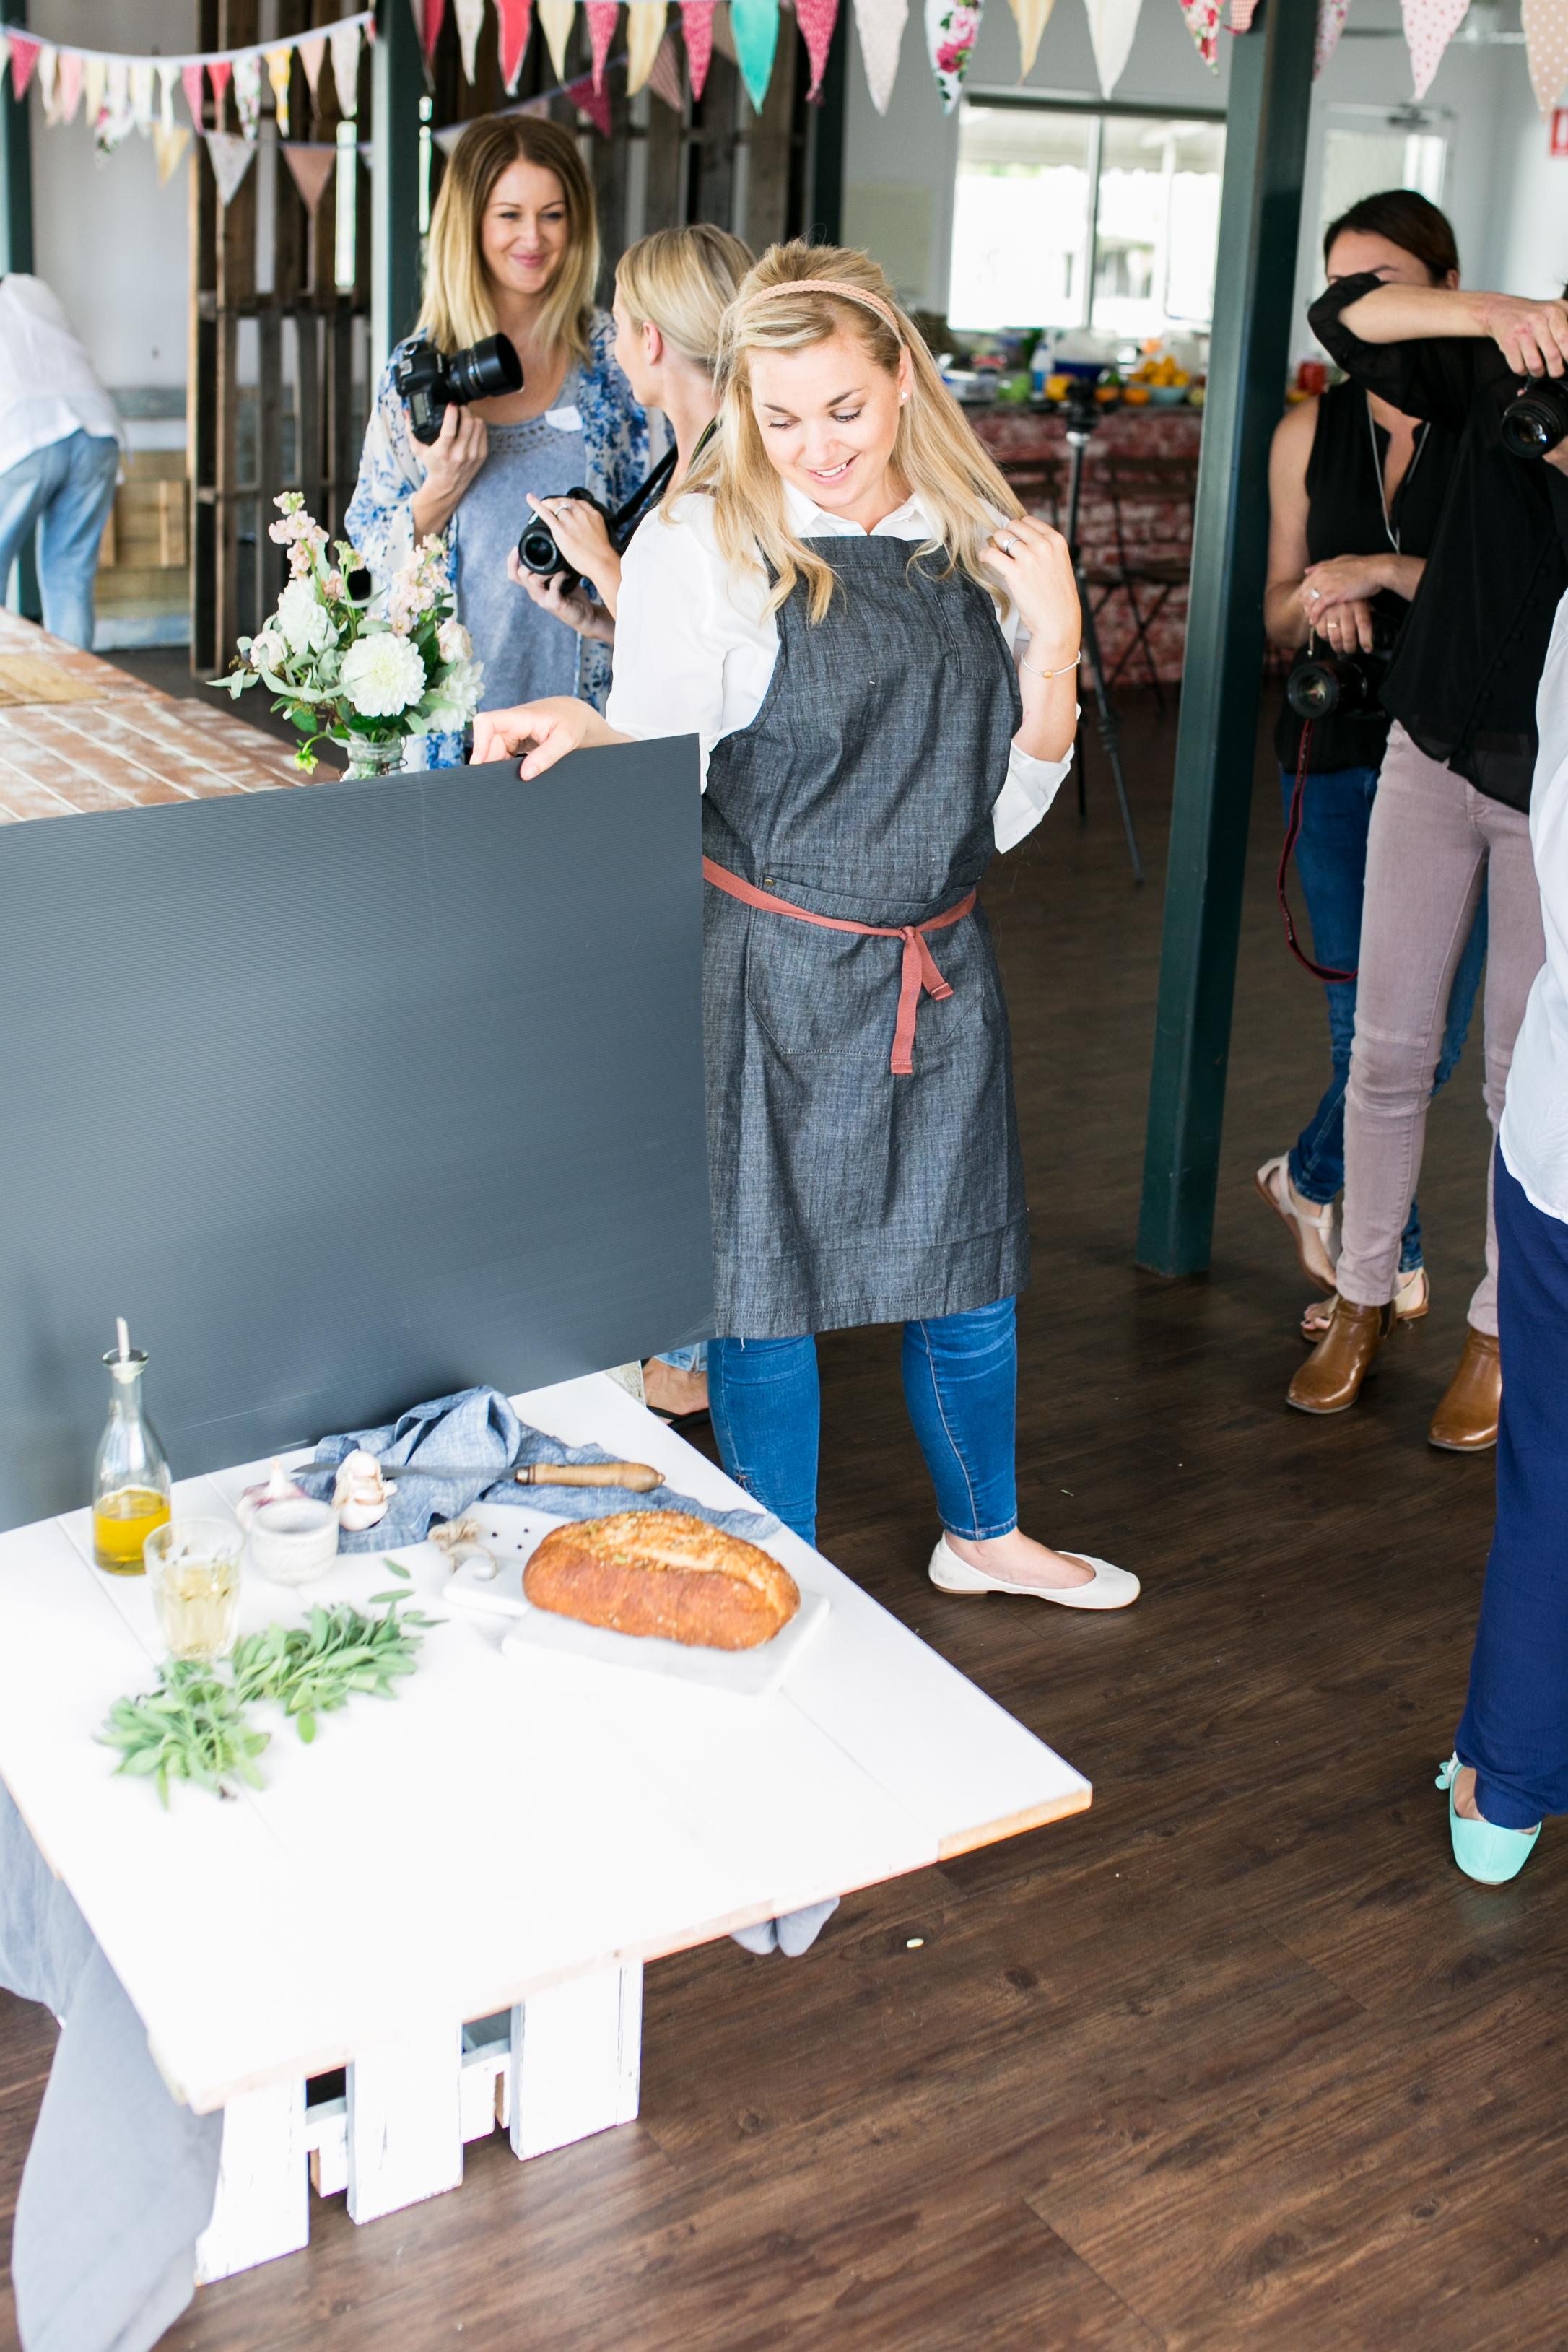 The Luminous Kitchen Food Photography Workshop Gold Coast 2016